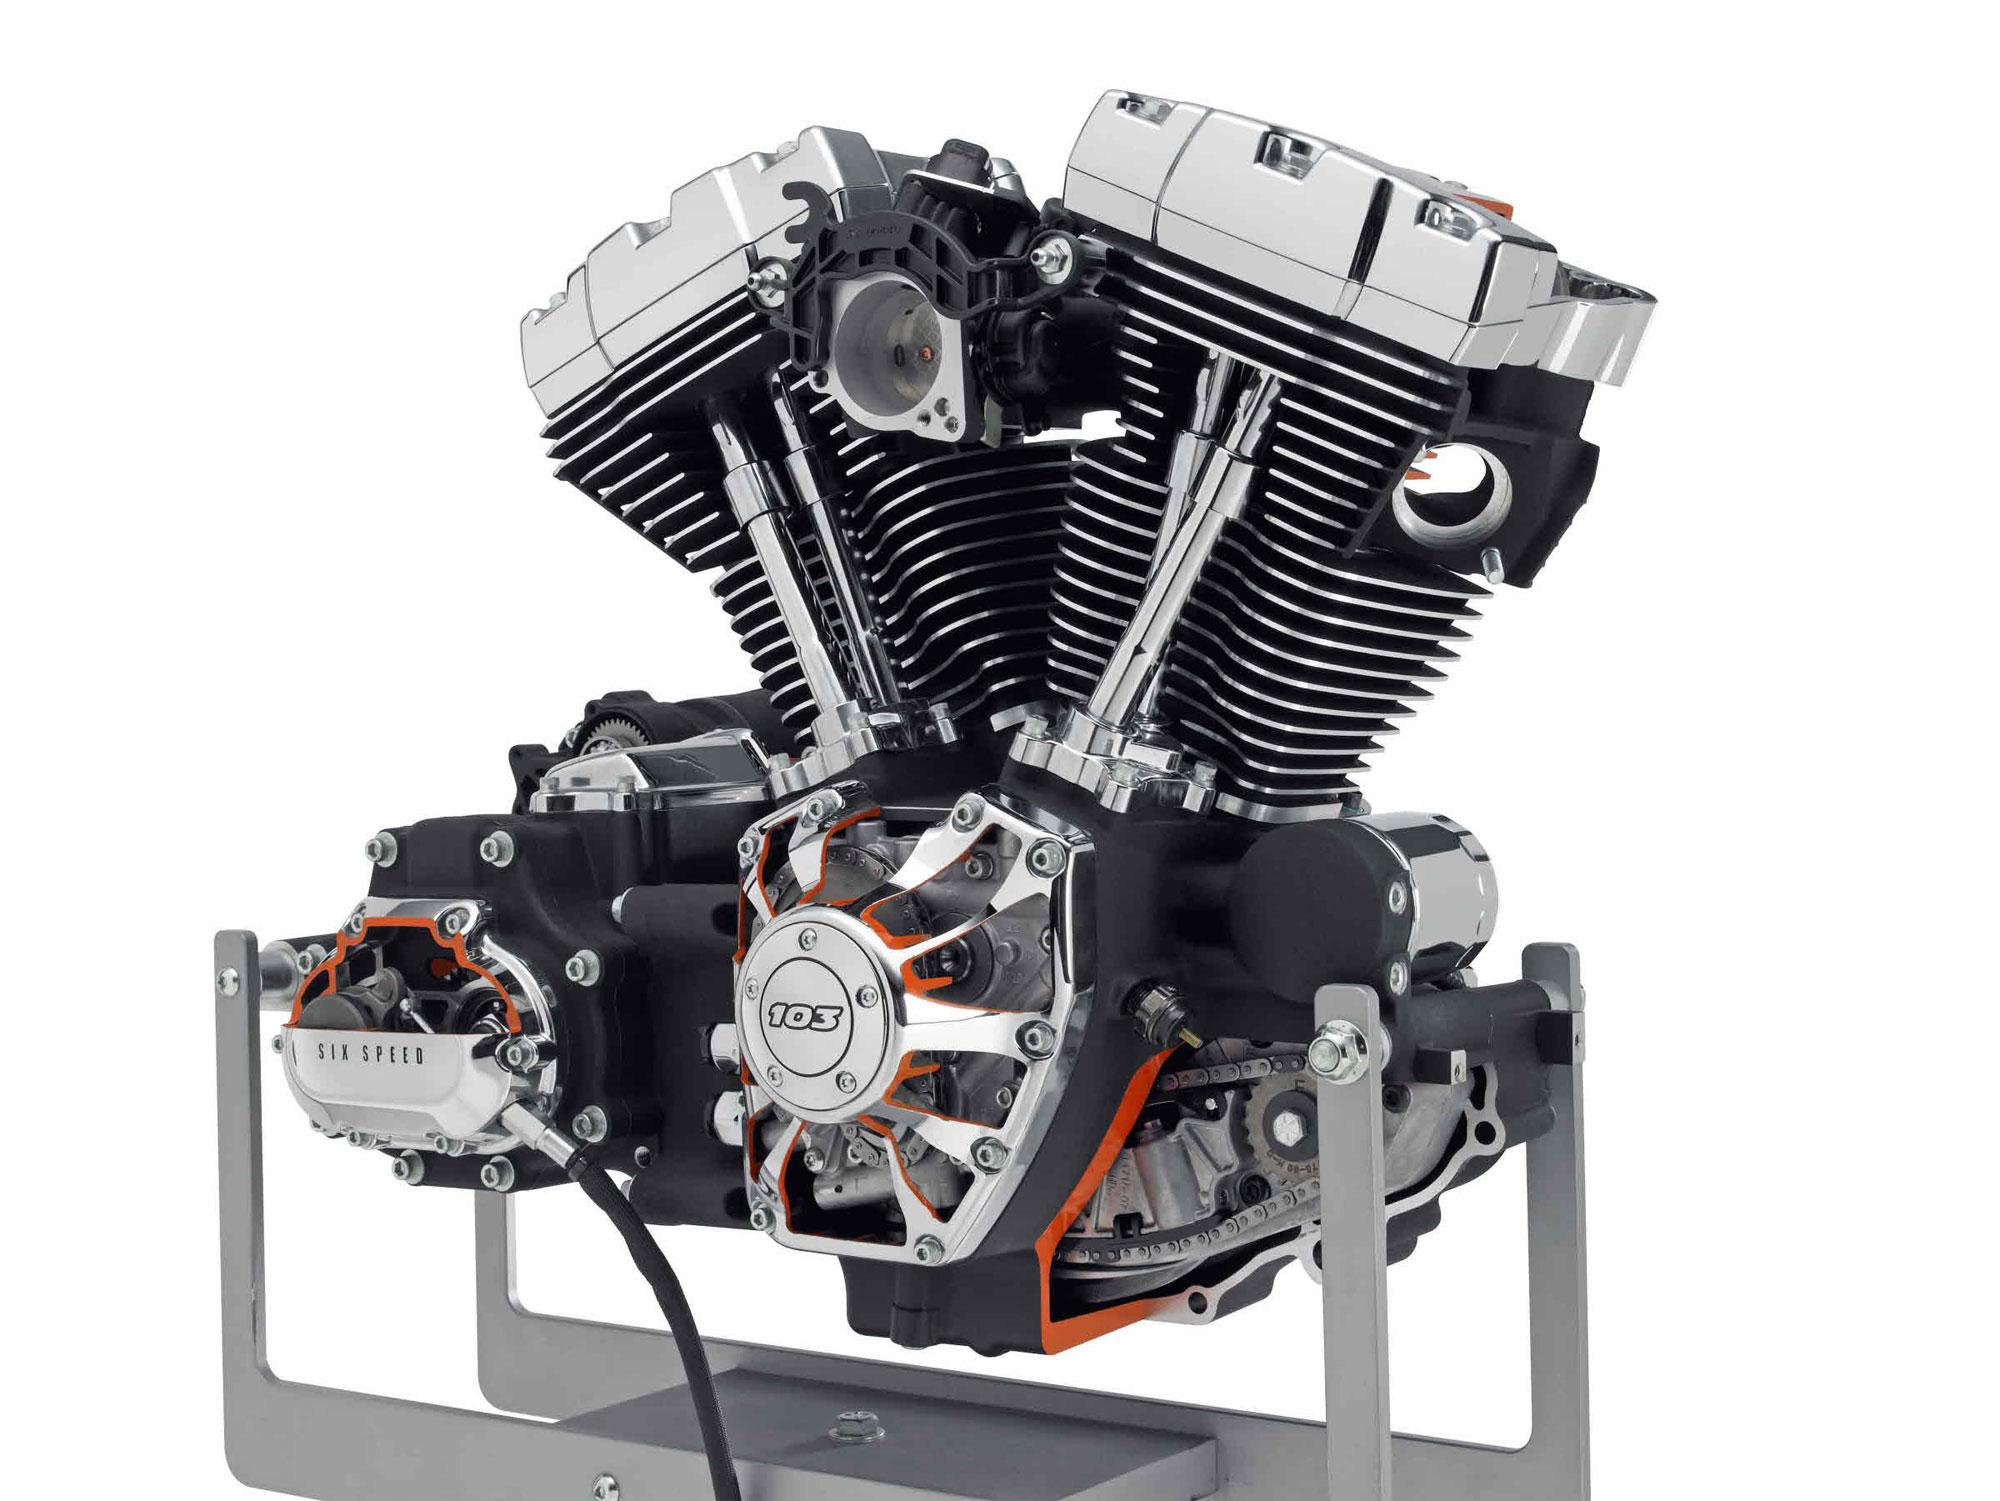 103 twin cam engine